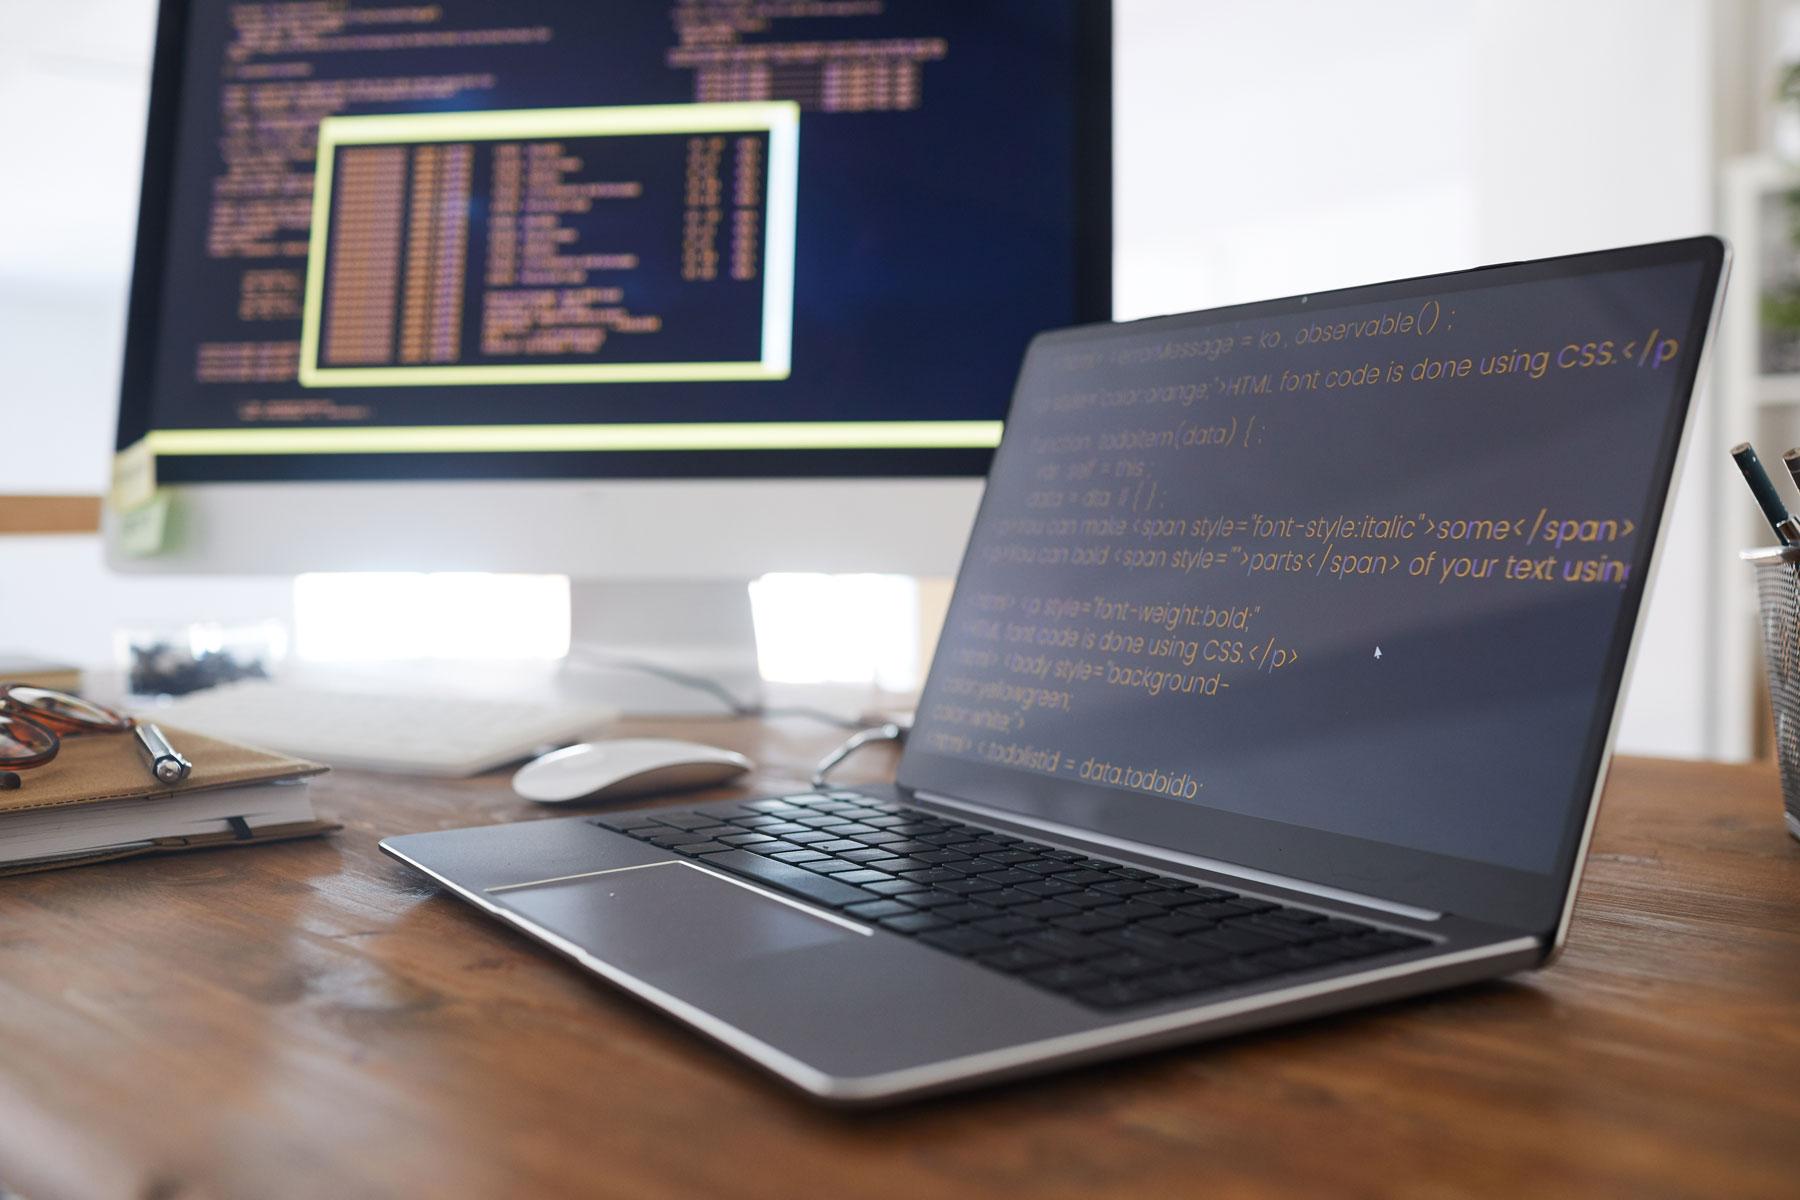 Web Development & Design, E-commerce Solutions, SEO & SEM, Social Media Services, Branding, Mobile Applications, Media Production